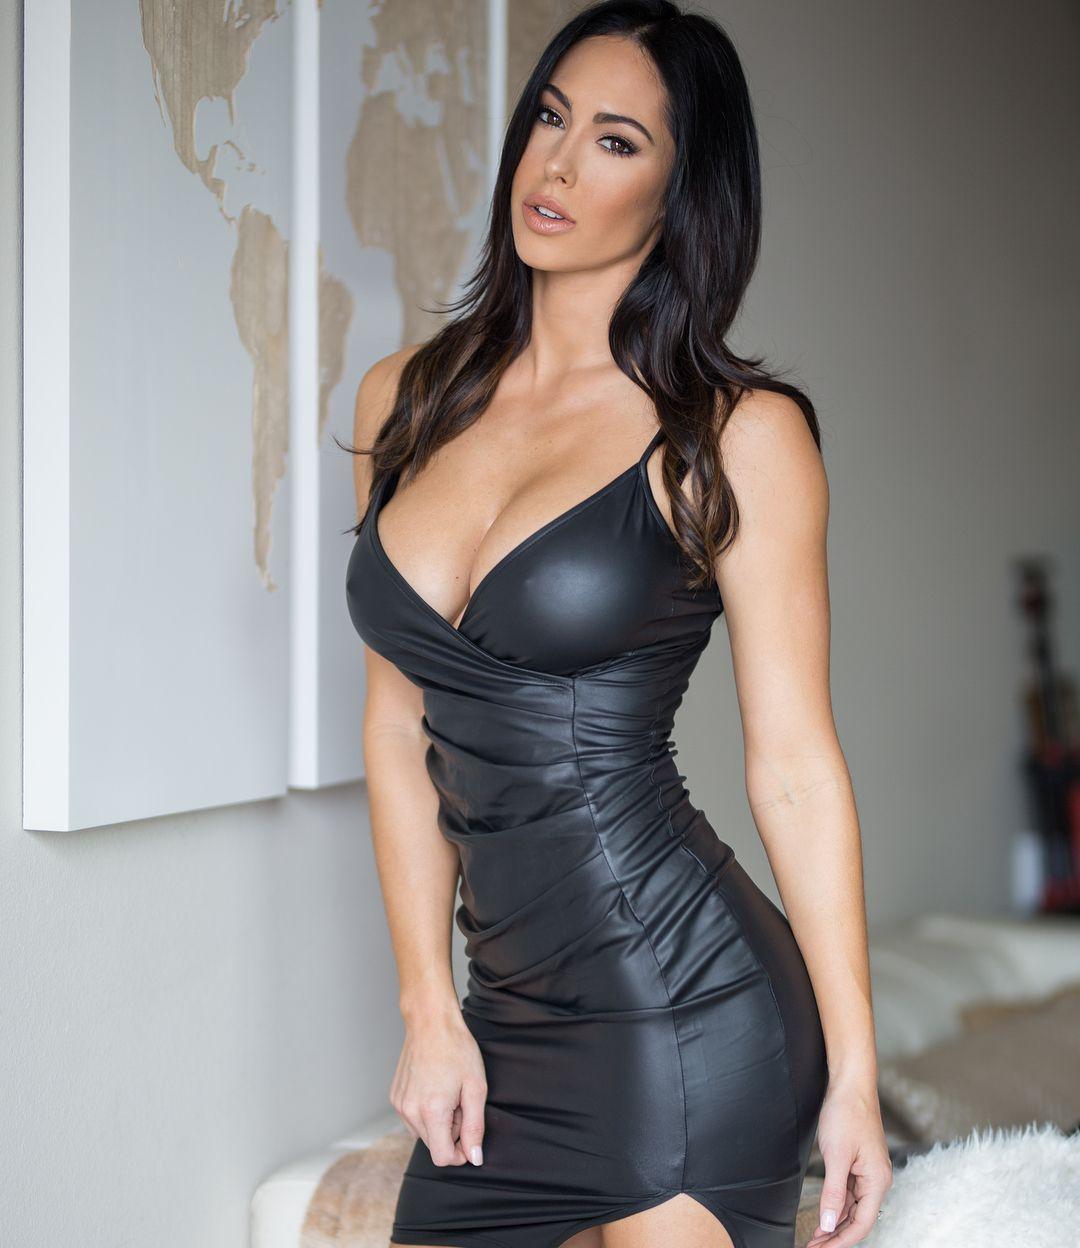 Sexy Milf Tight Dress